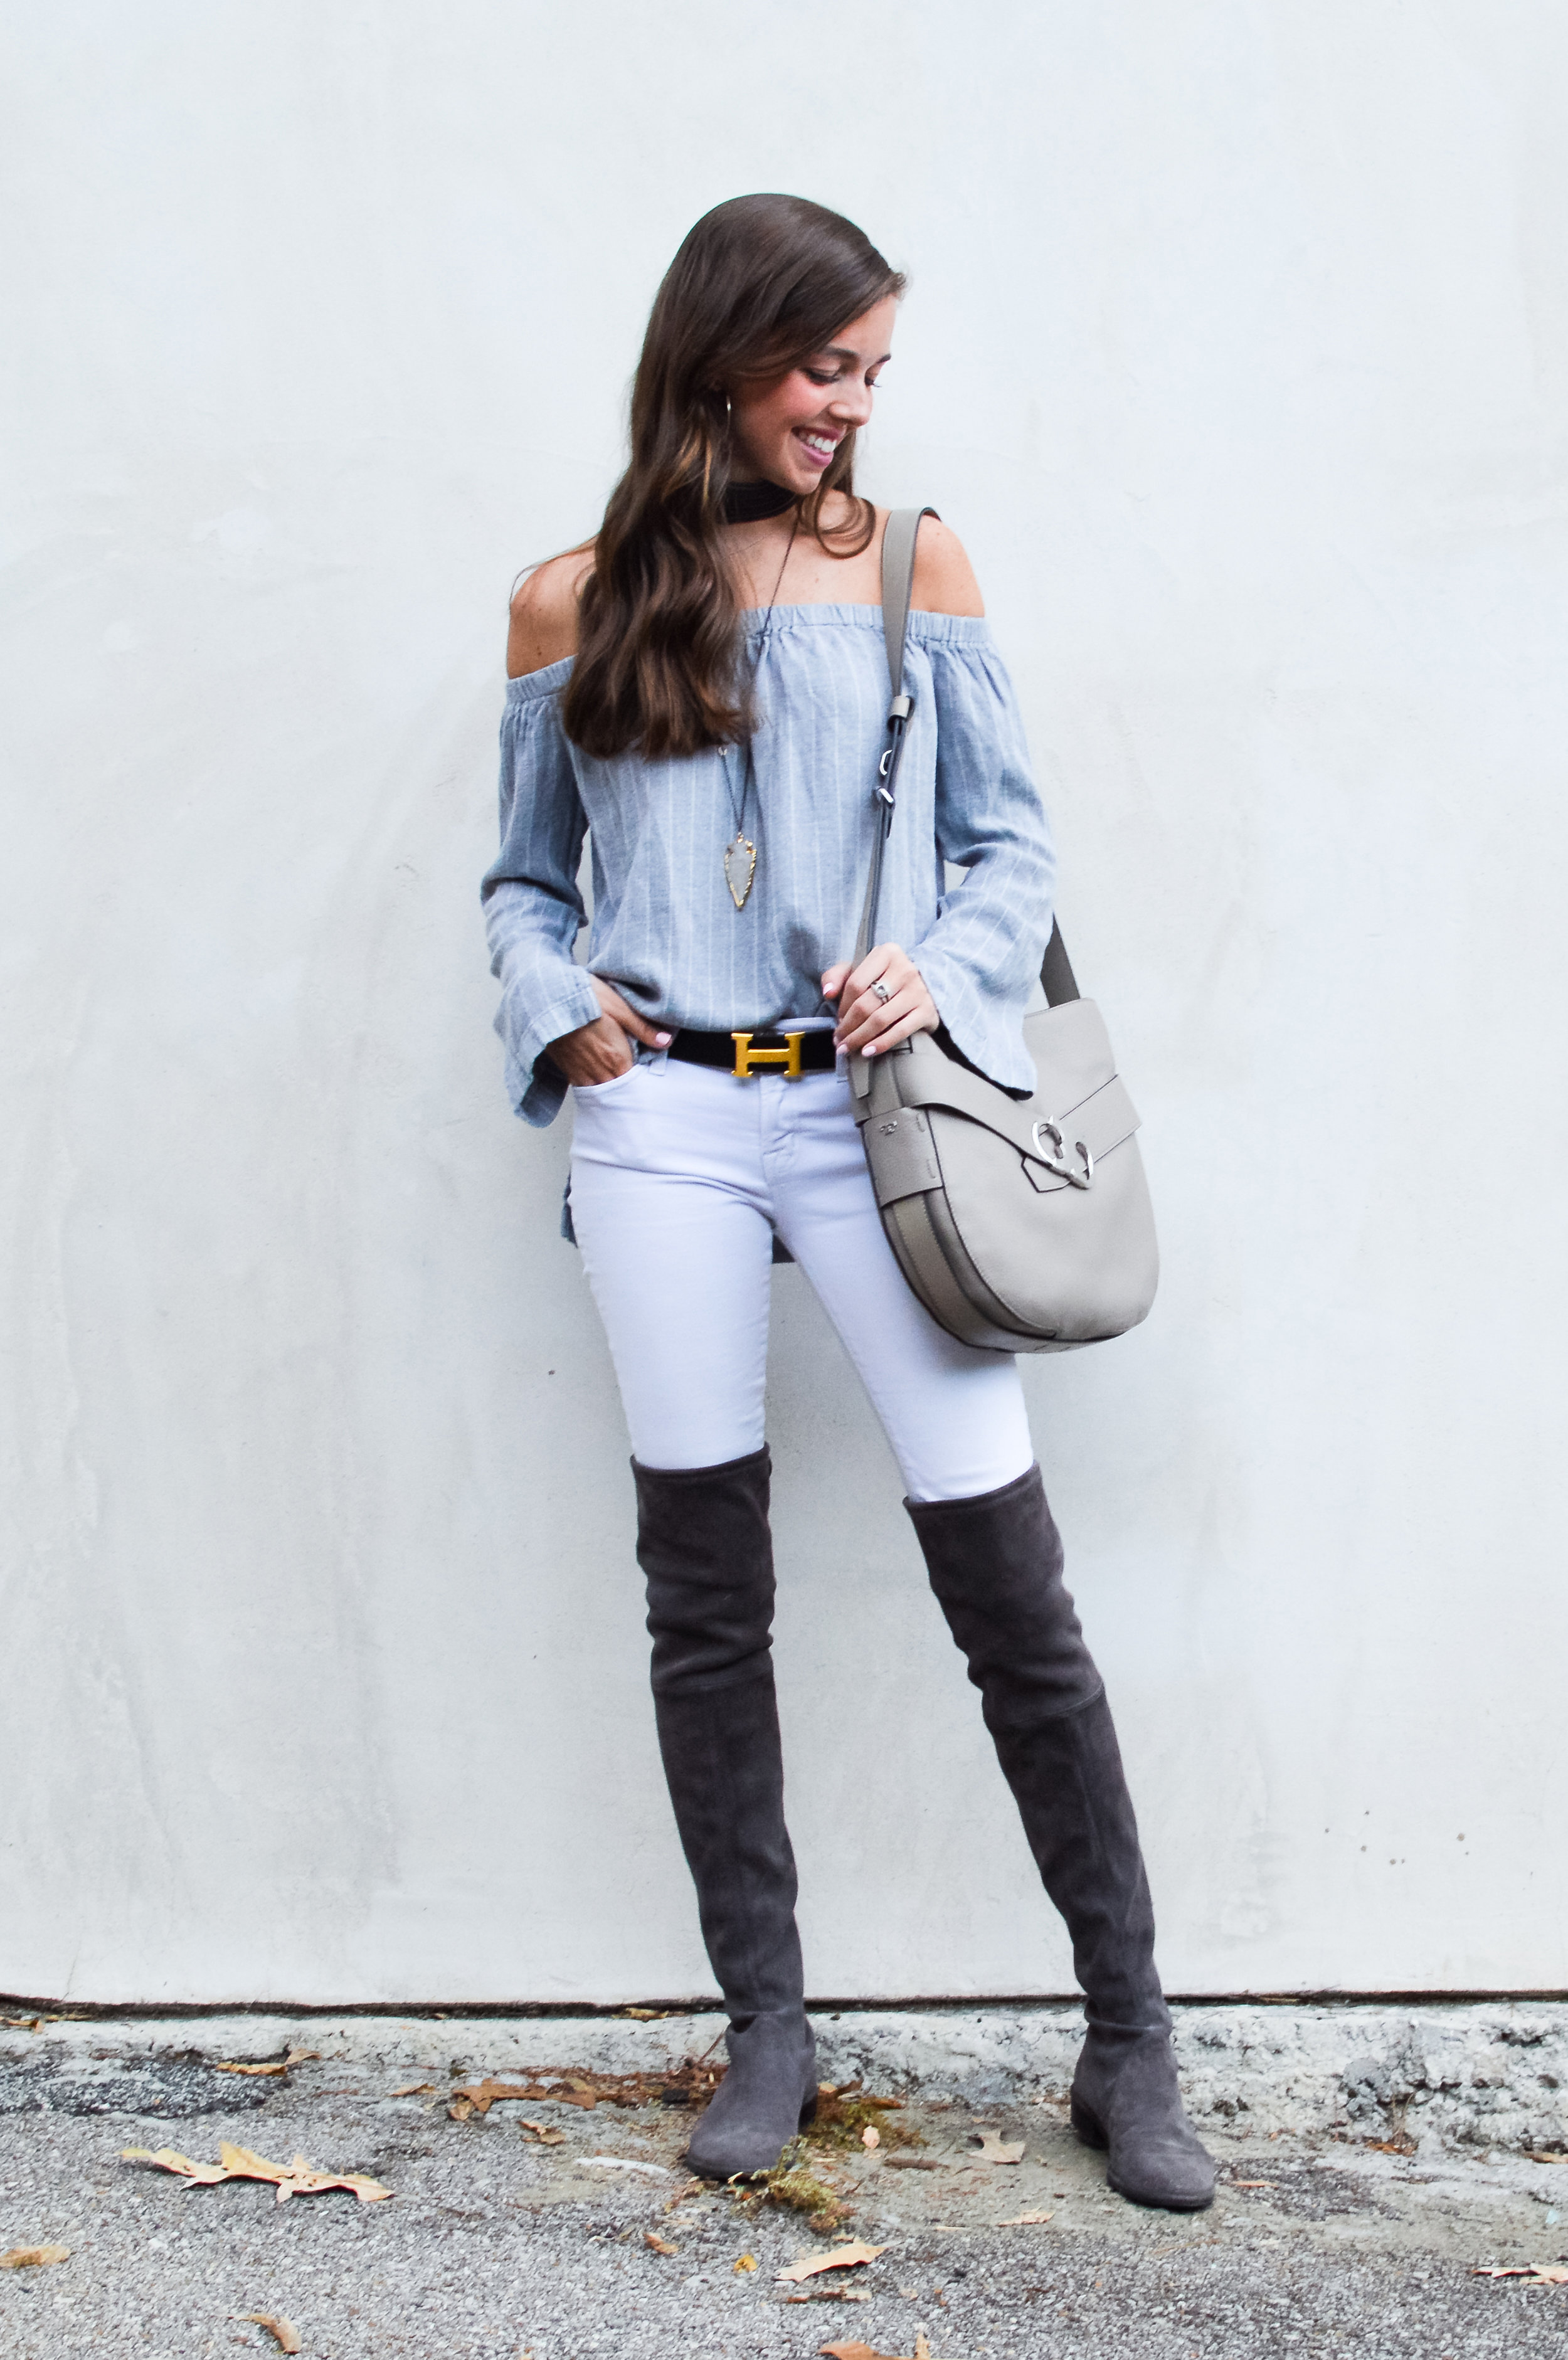 fashion blogger lcb style stuart weitzman tory burch over the knee fall fashion (22 of 29).jpg